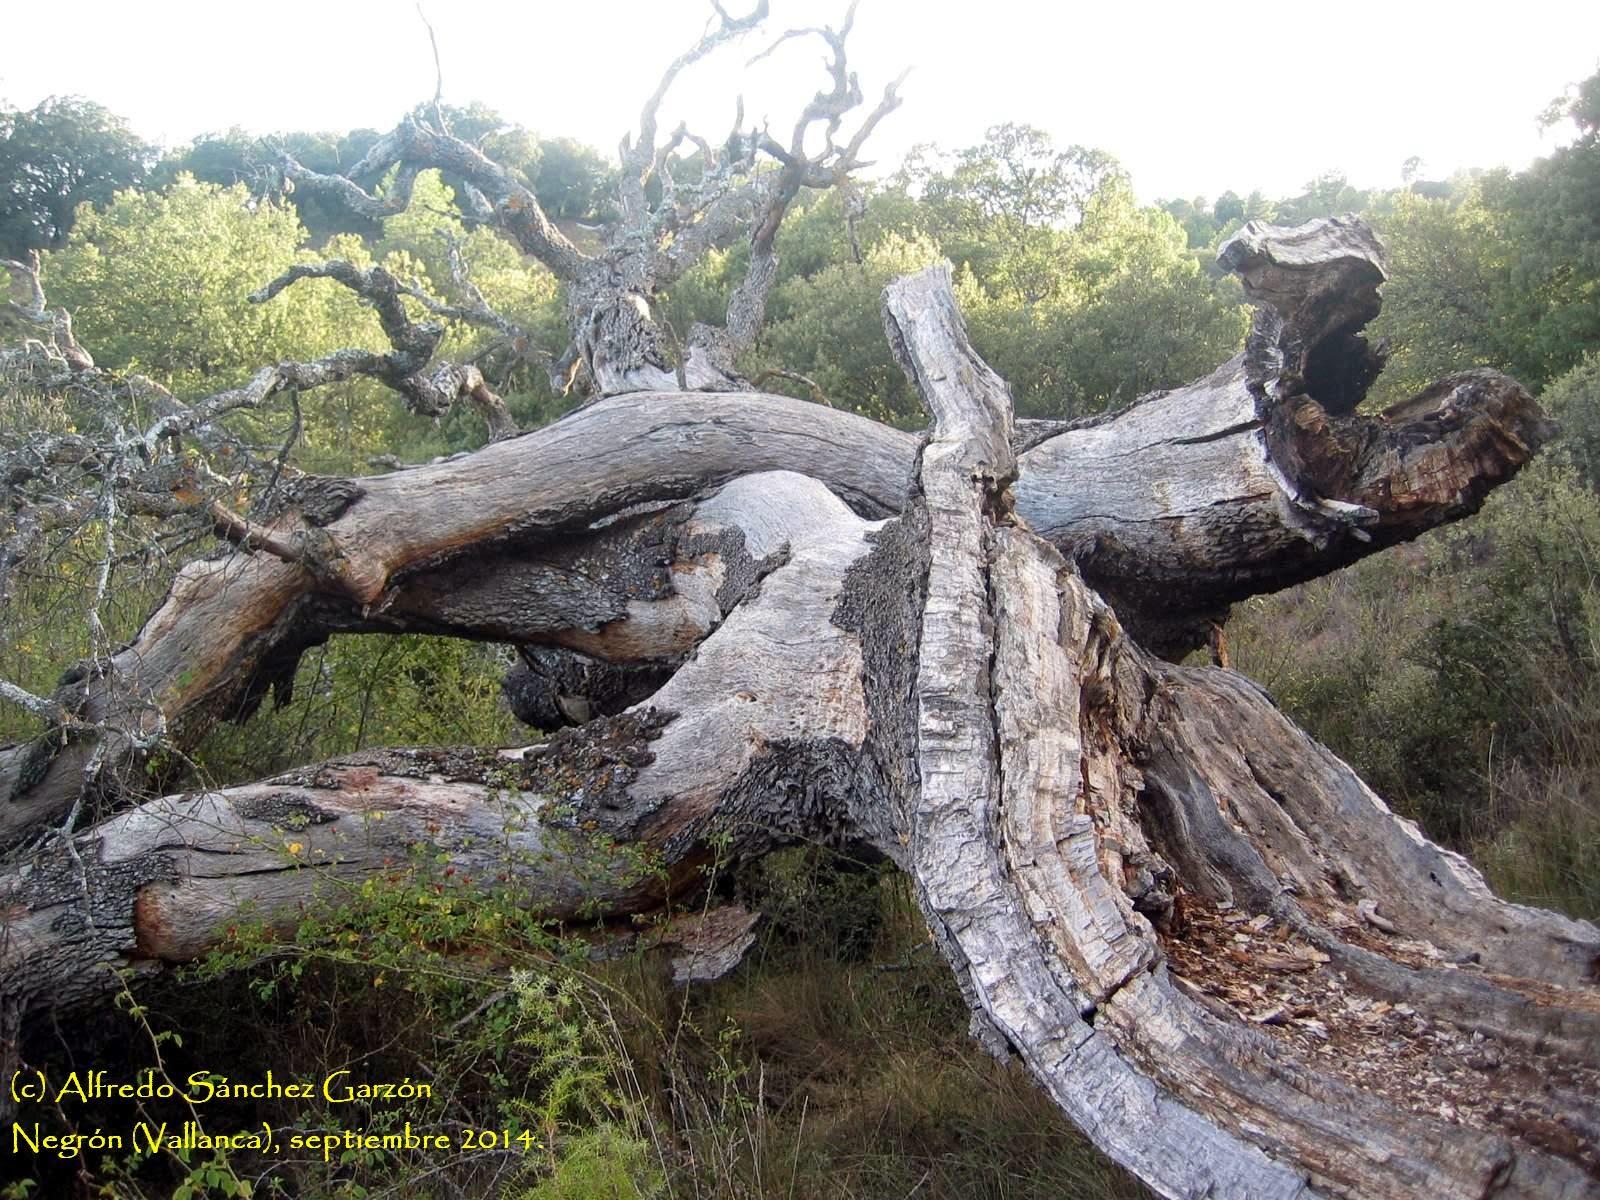 tronco-arbol-monumental-carrasca-negron